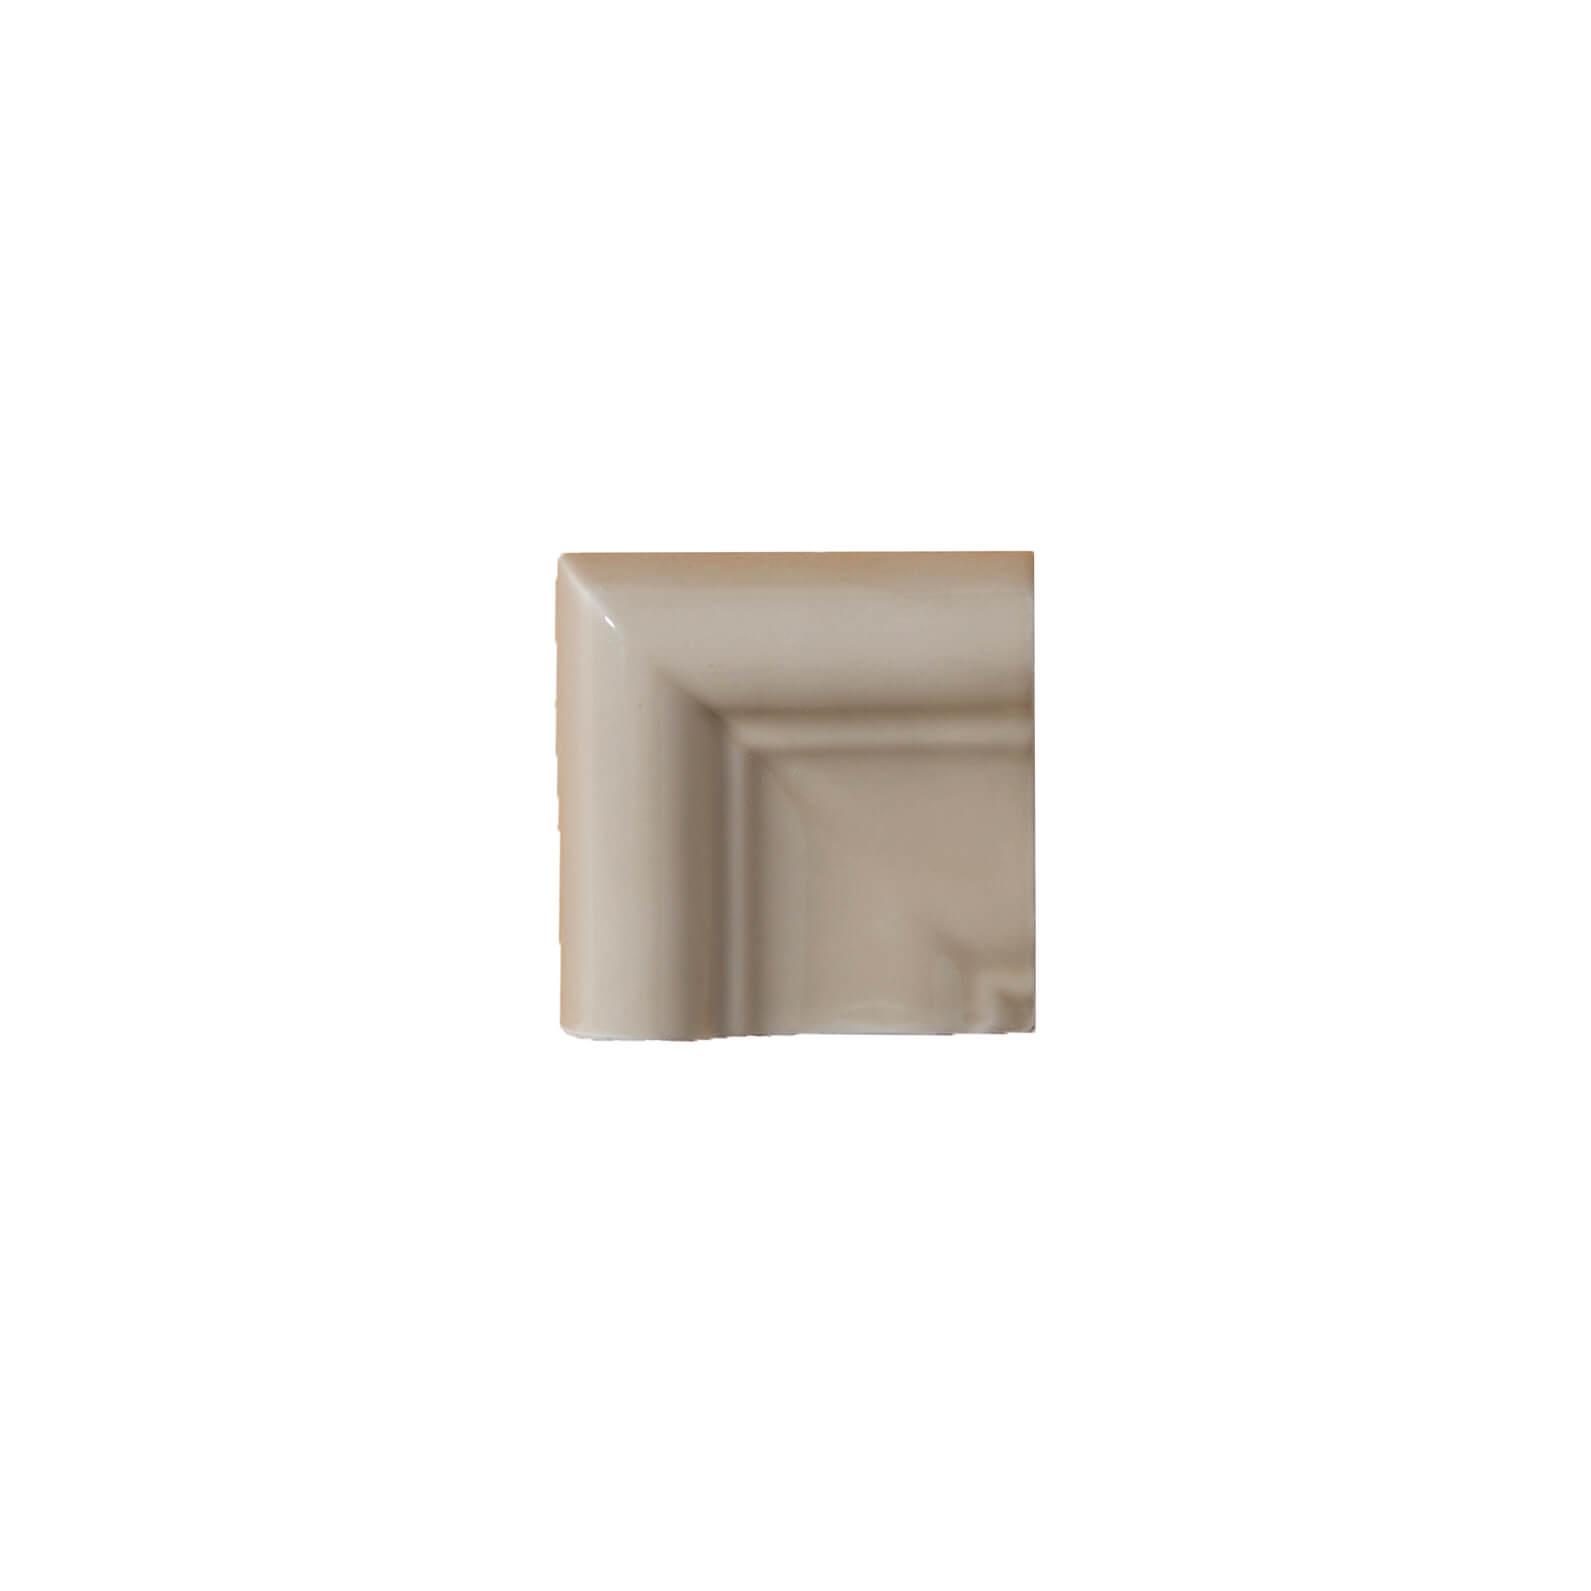 ADST5166 - ANGULO MARCO CORNISA - 7.5 cm X 19.8 cm